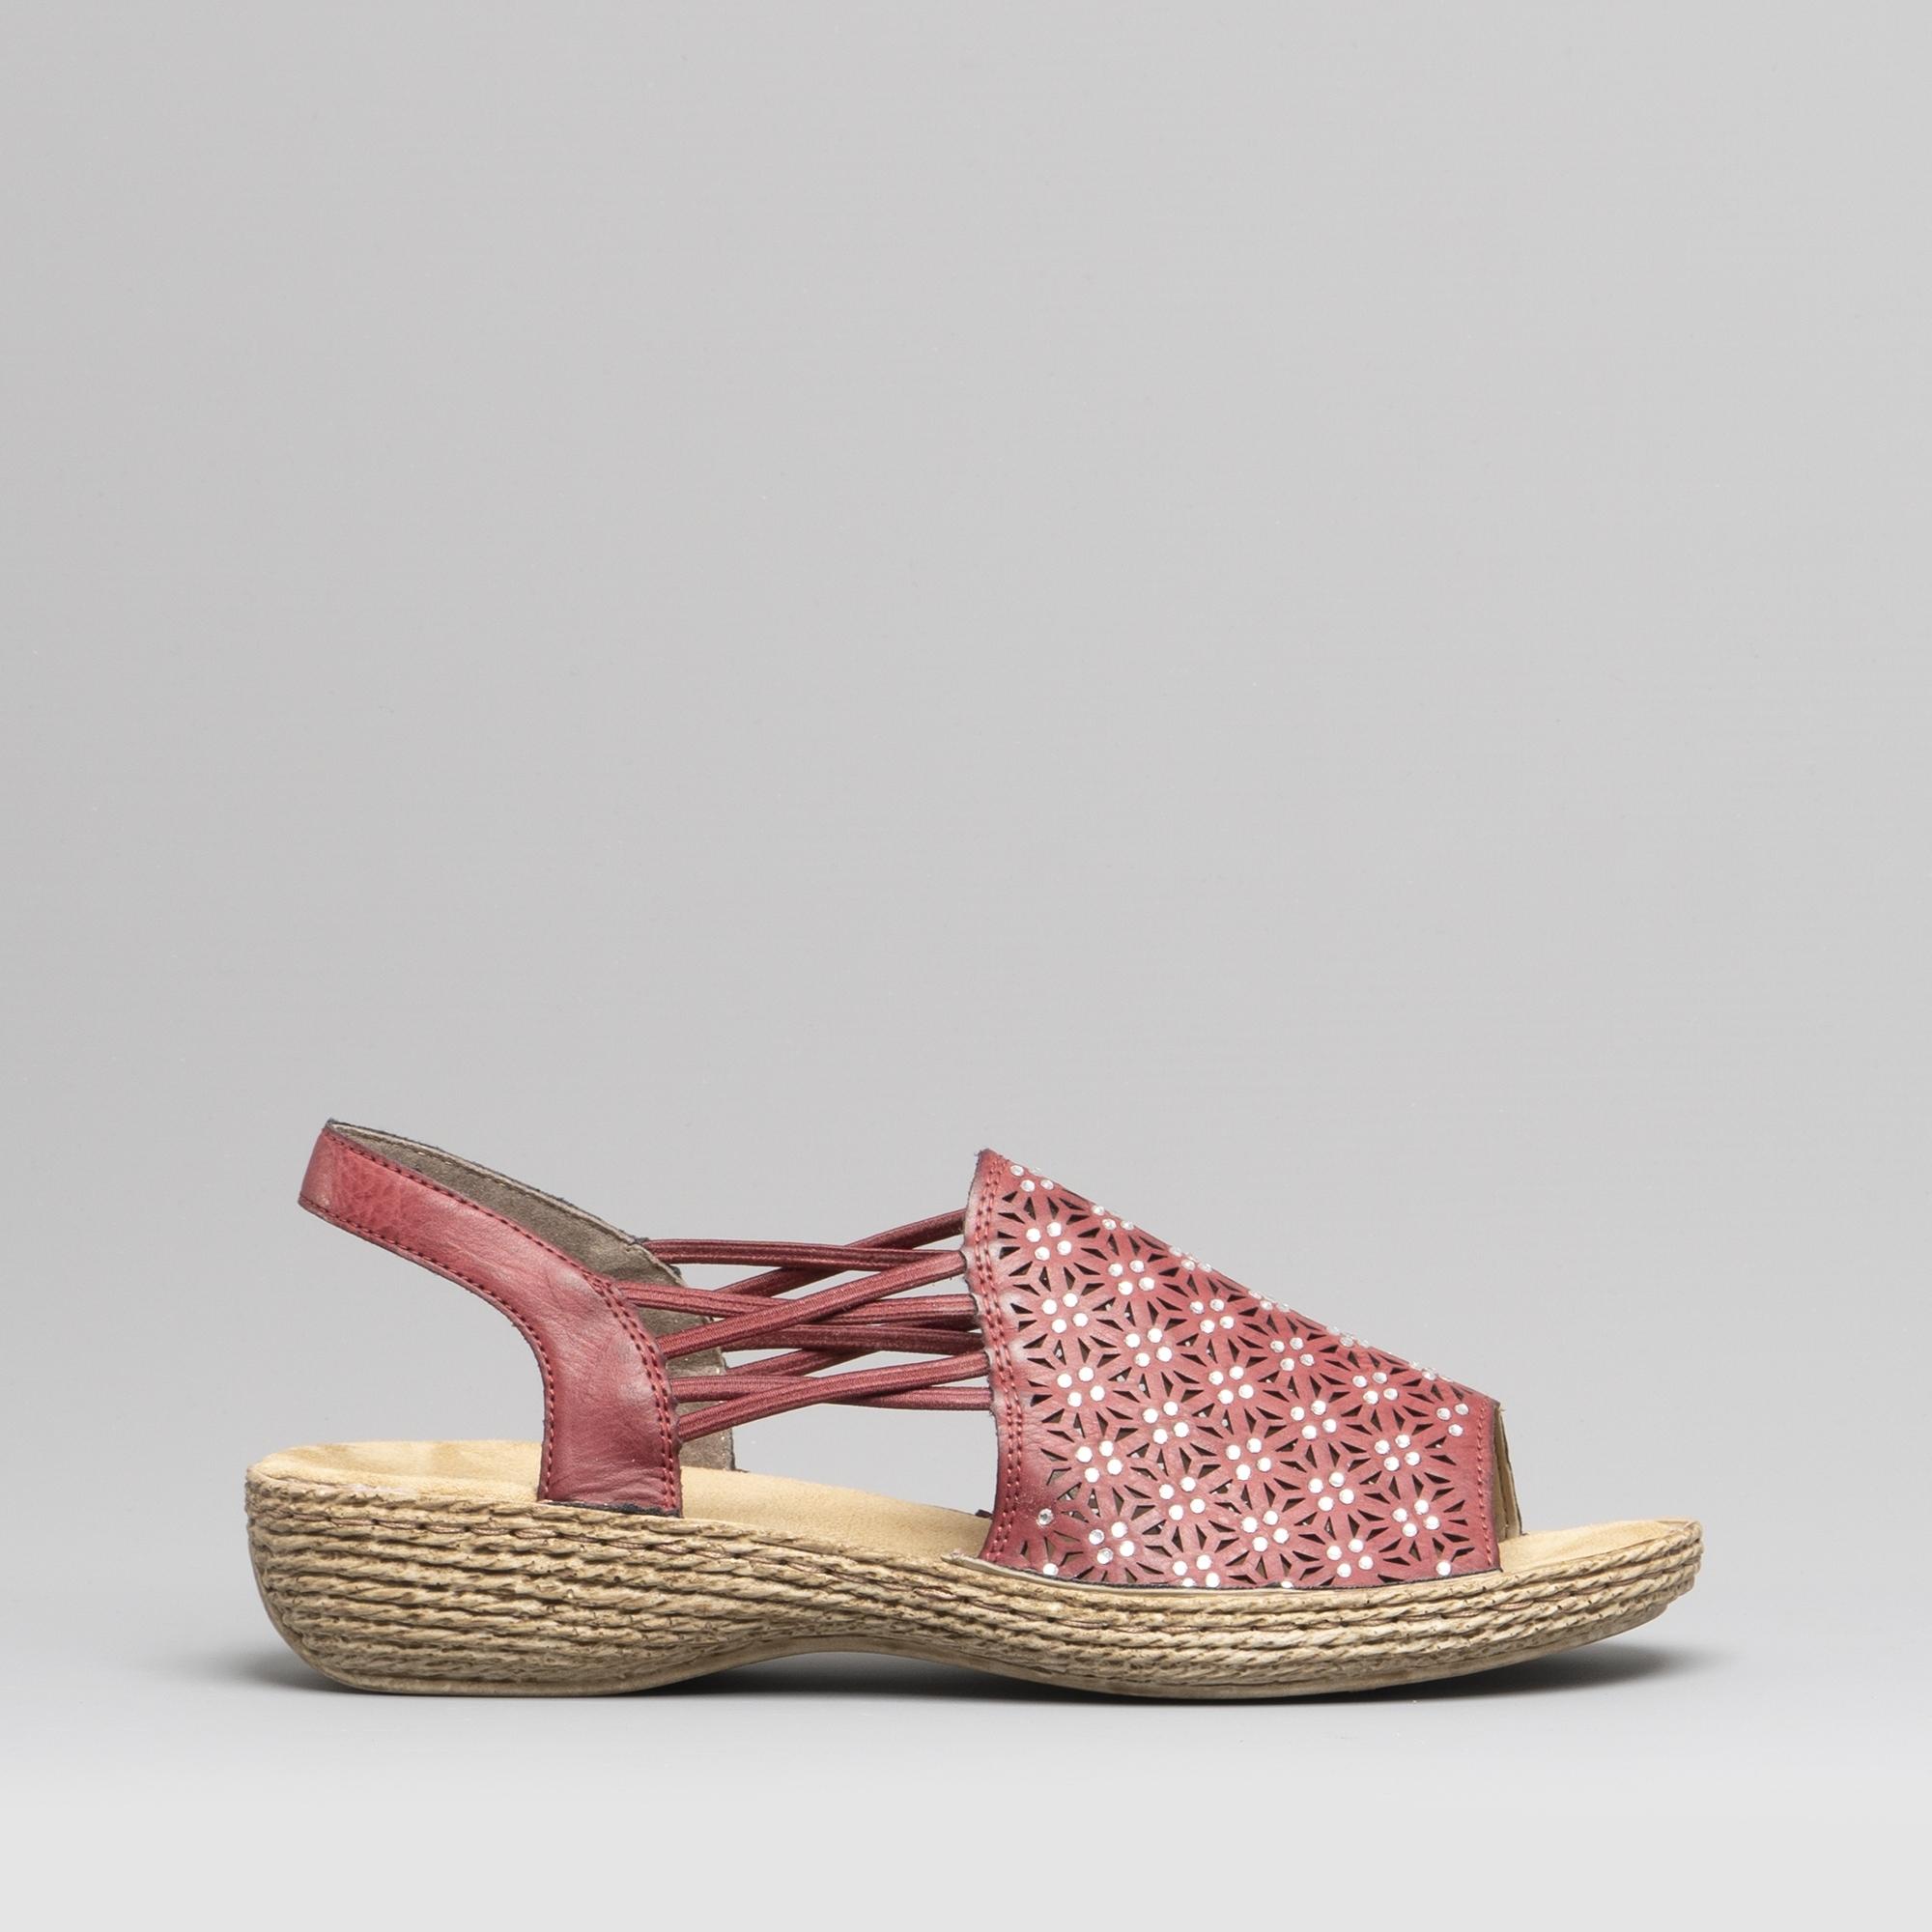 Slip On Wine 658b2 Rieker Ladies Sandals 35 PkZXuTiO